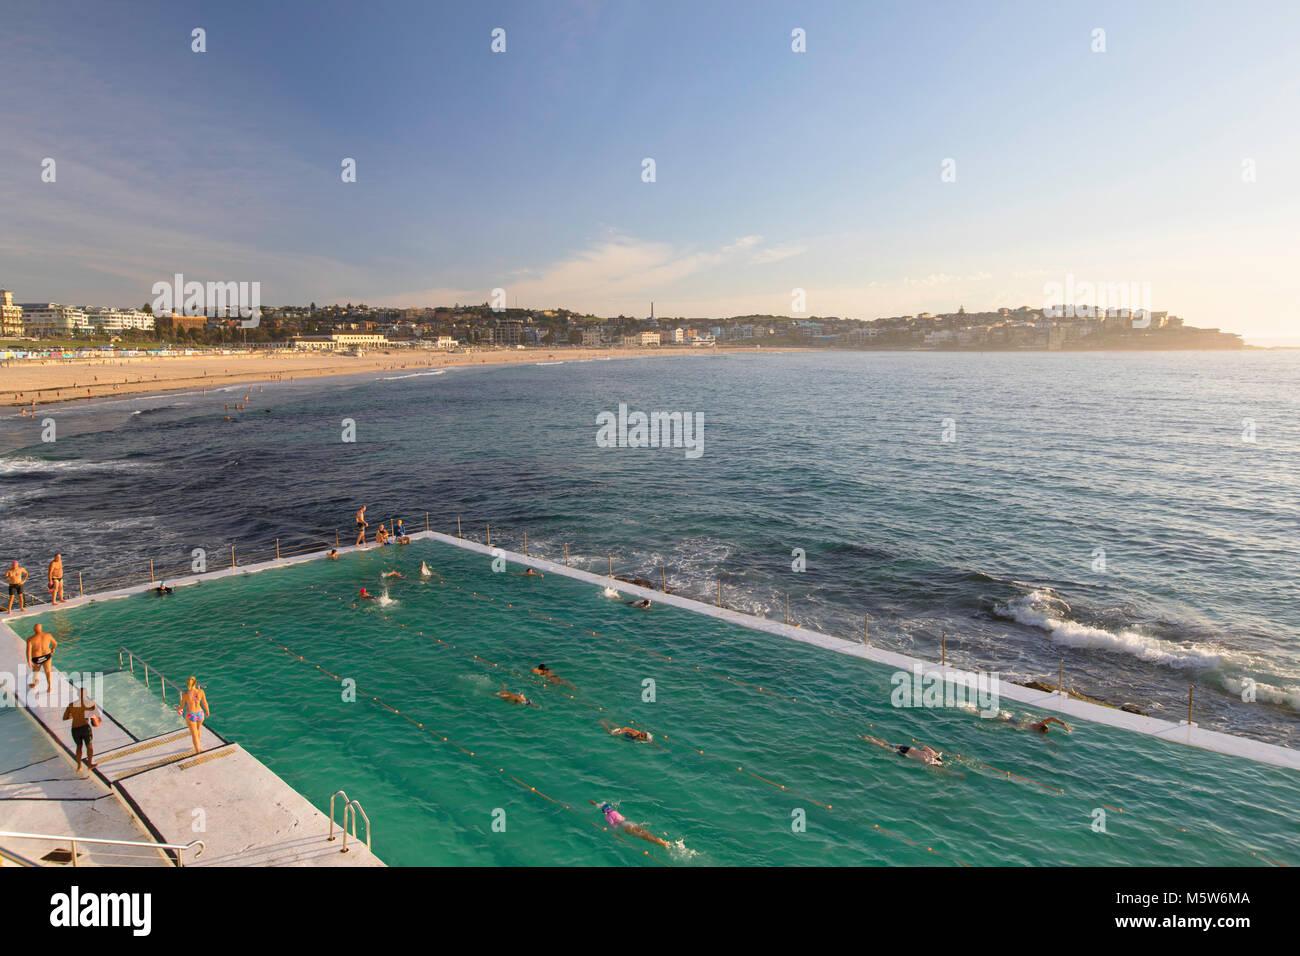 Bondi Icebergs swimming pool, Bondi Beach, Sydney, New South Wales, Australia Stock Photo